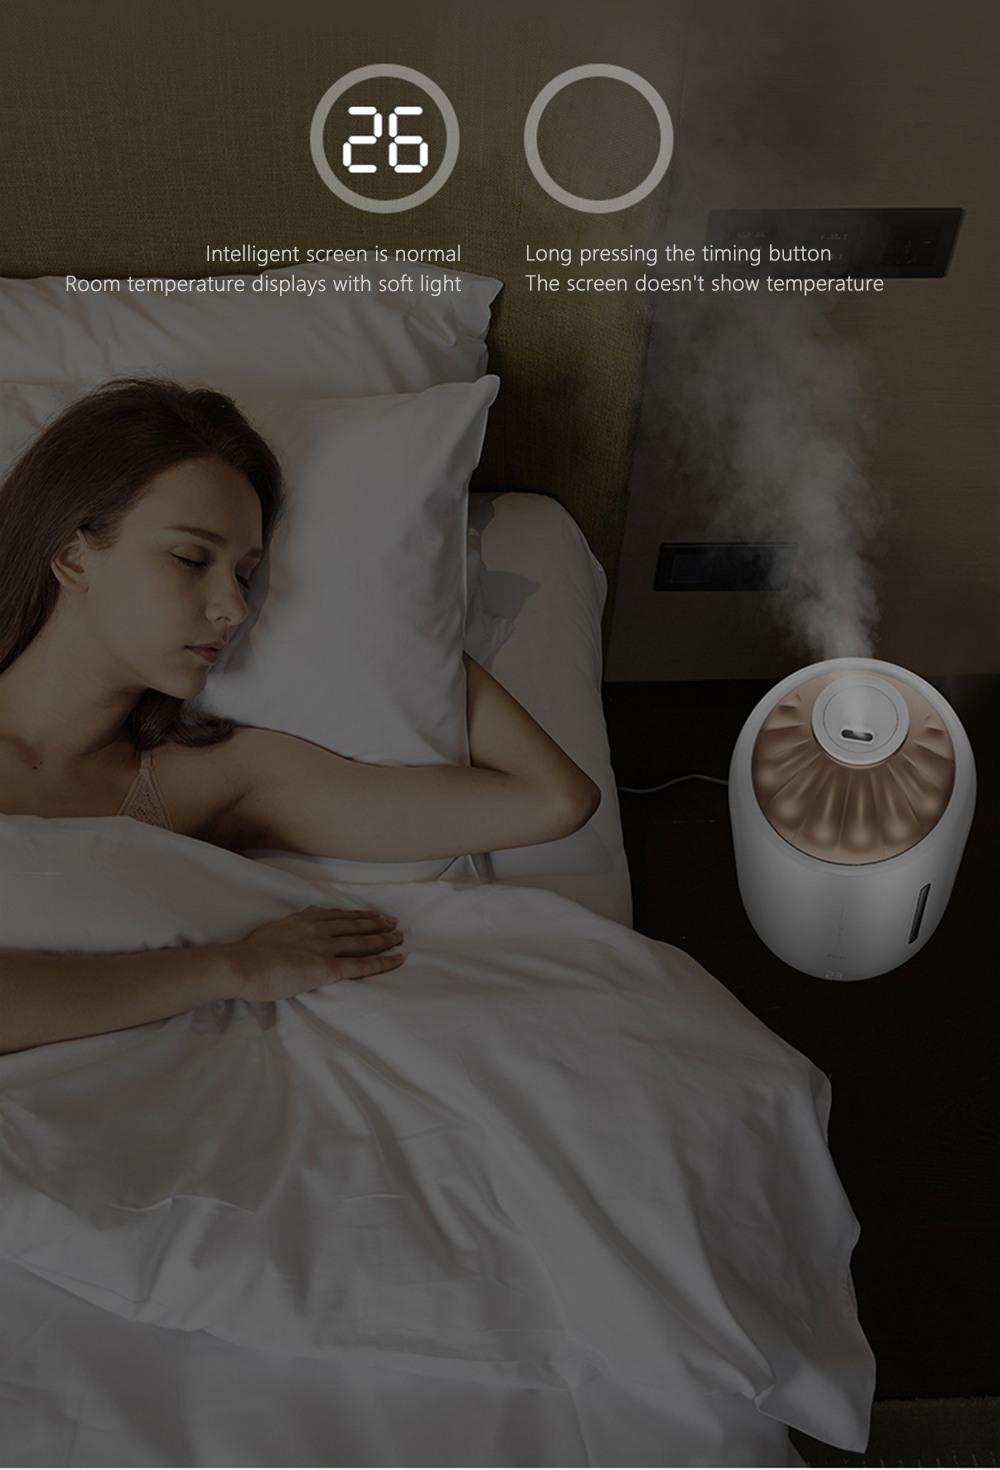 deerma household air humidifier price